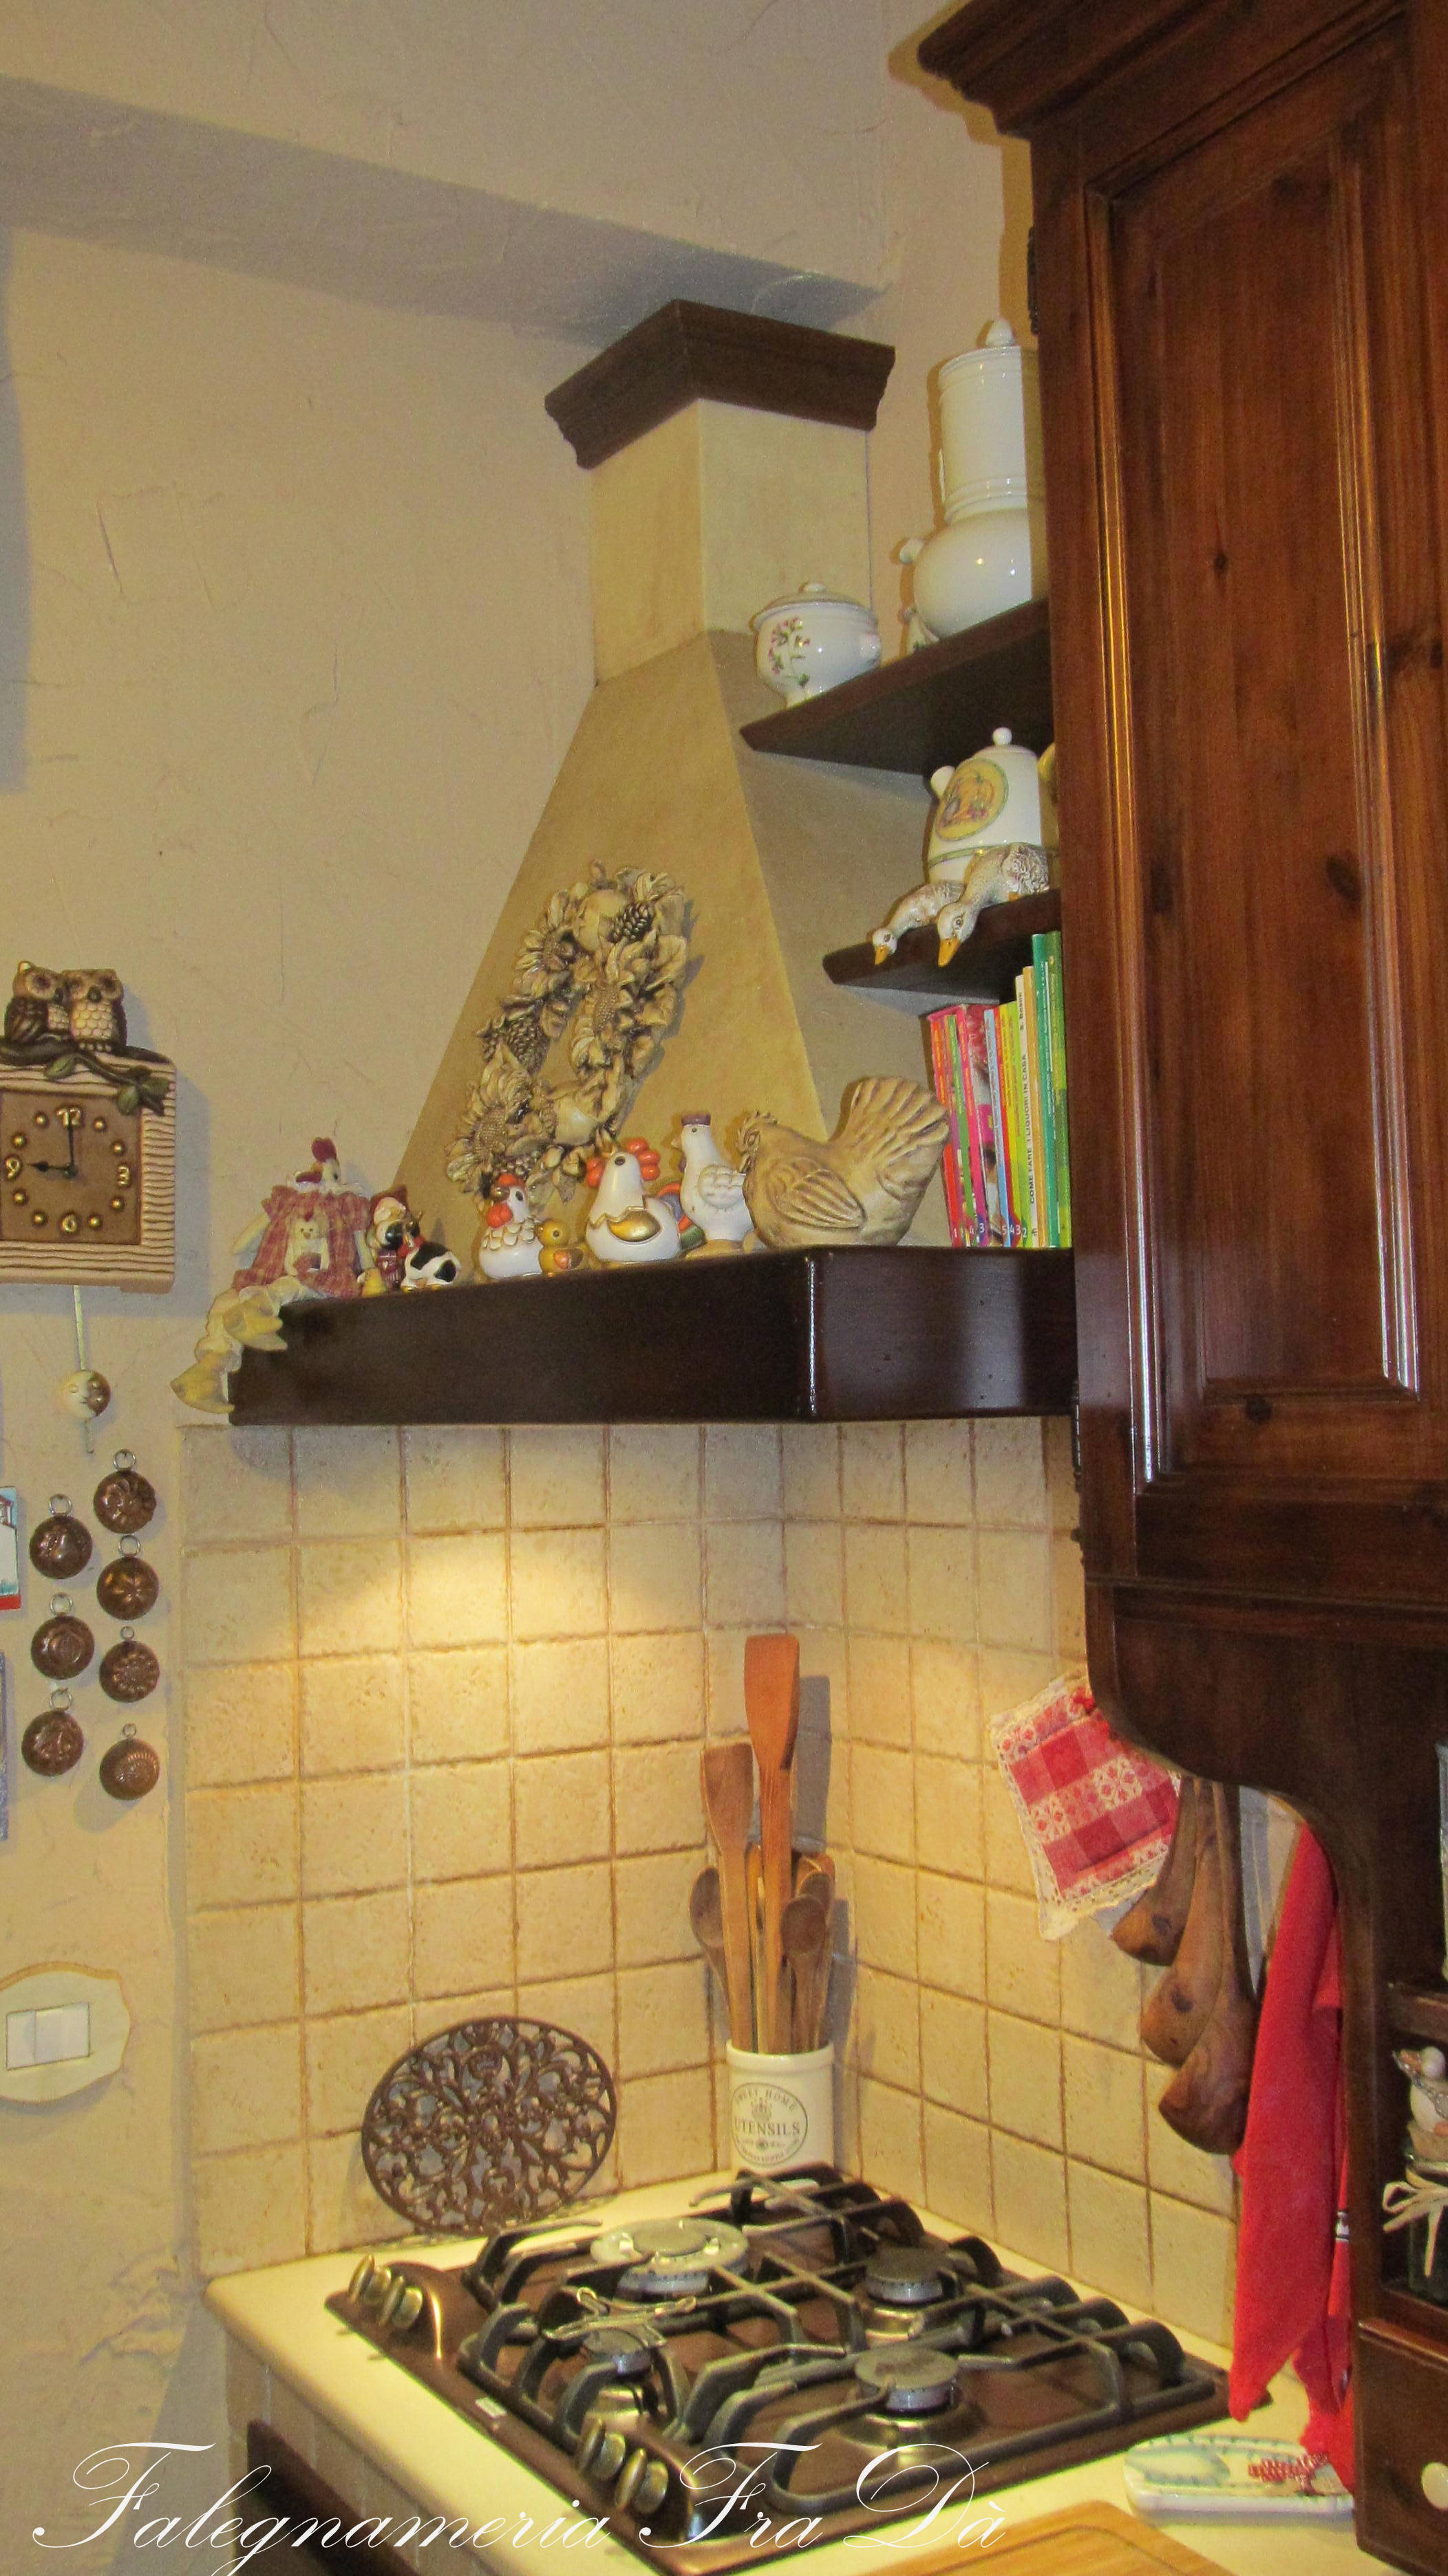 cappa in legno cucina artigianale fradà